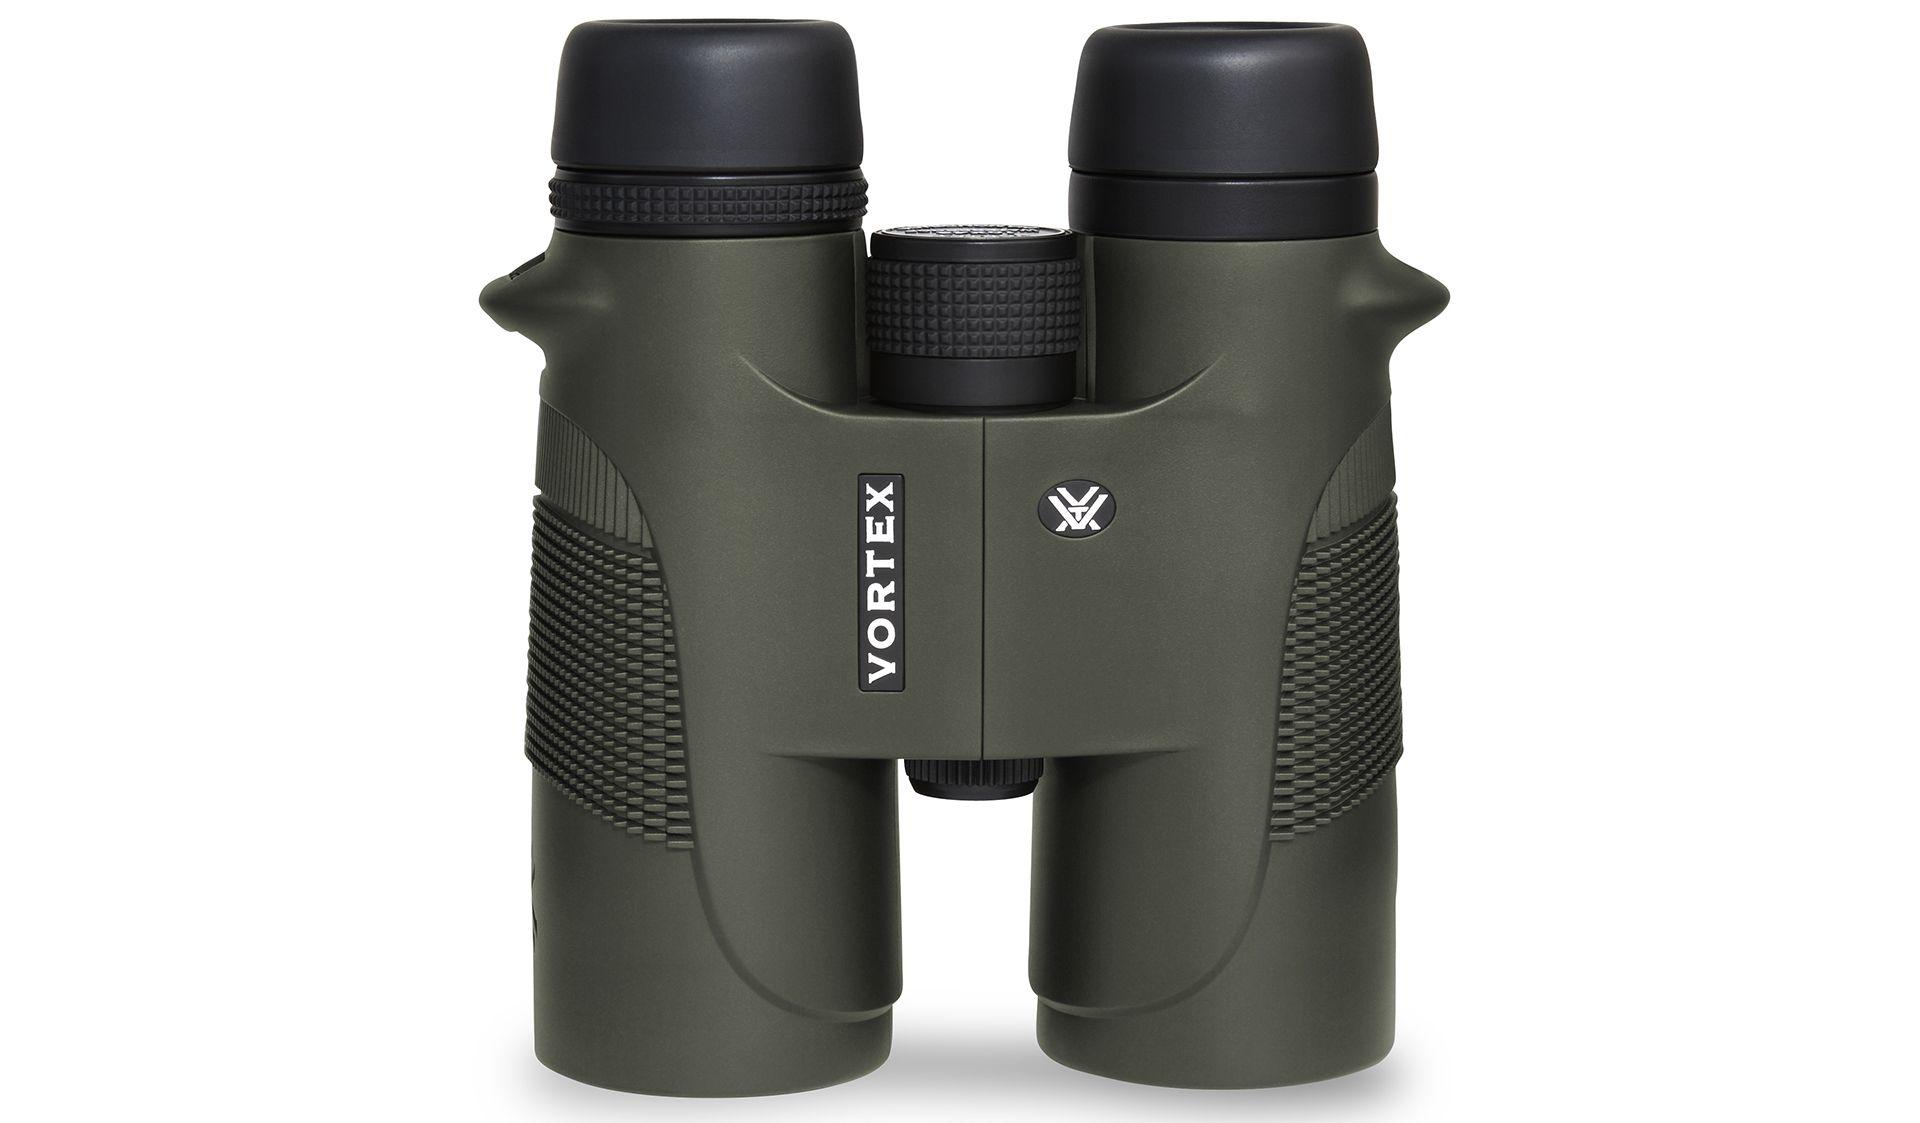 Vortex Optics Diamondback 8x42 Roof Prism Binoculars134.99 $134.99